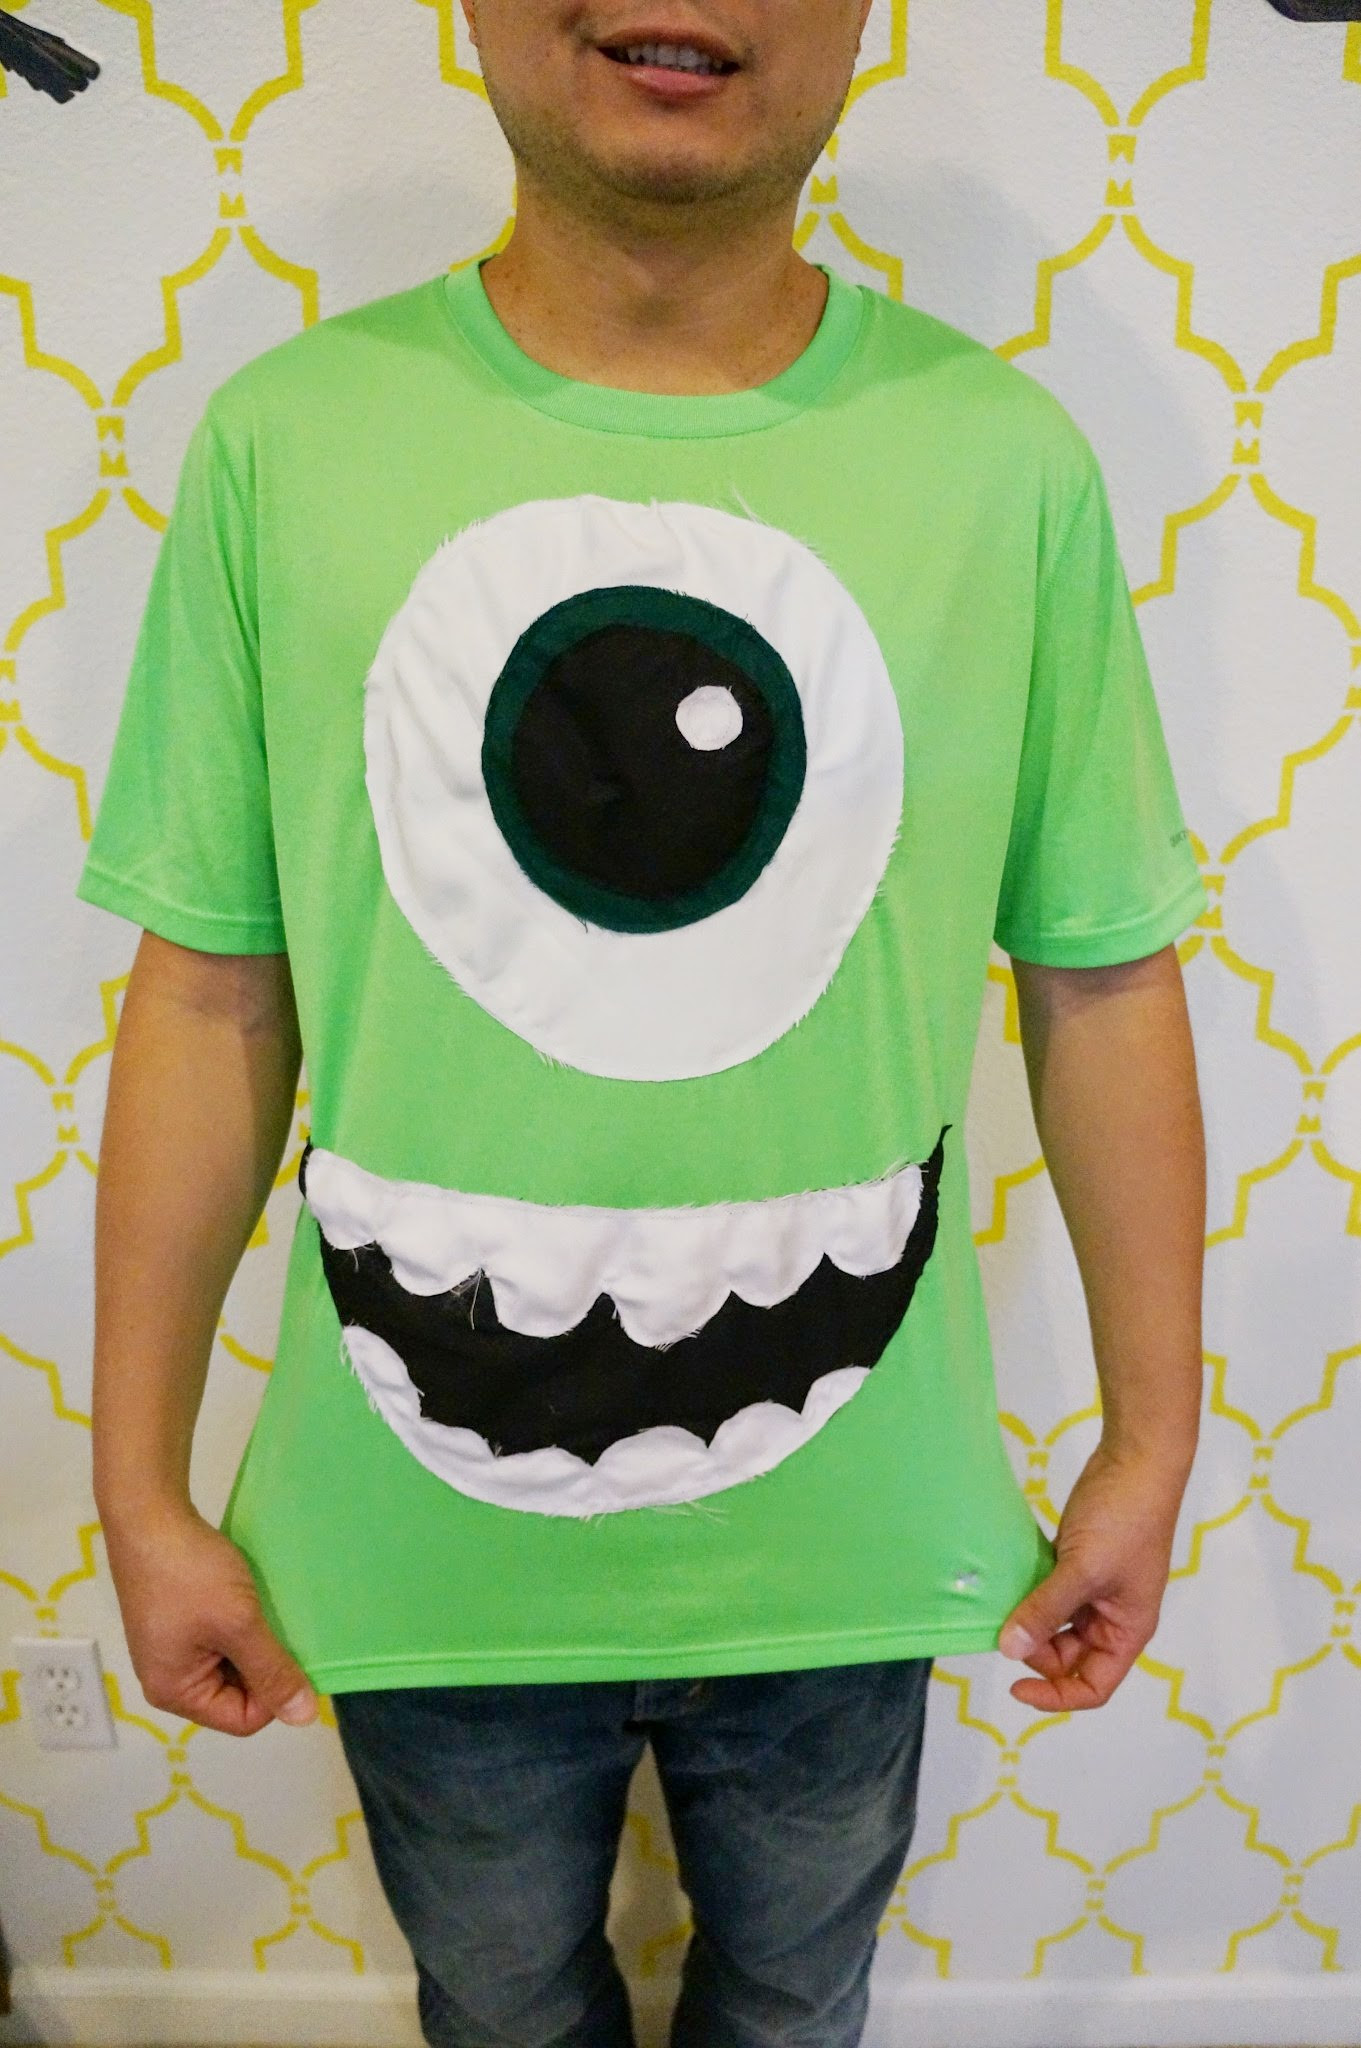 DIY Monsters Inc Costume  DIY Monster's Inc Costumes